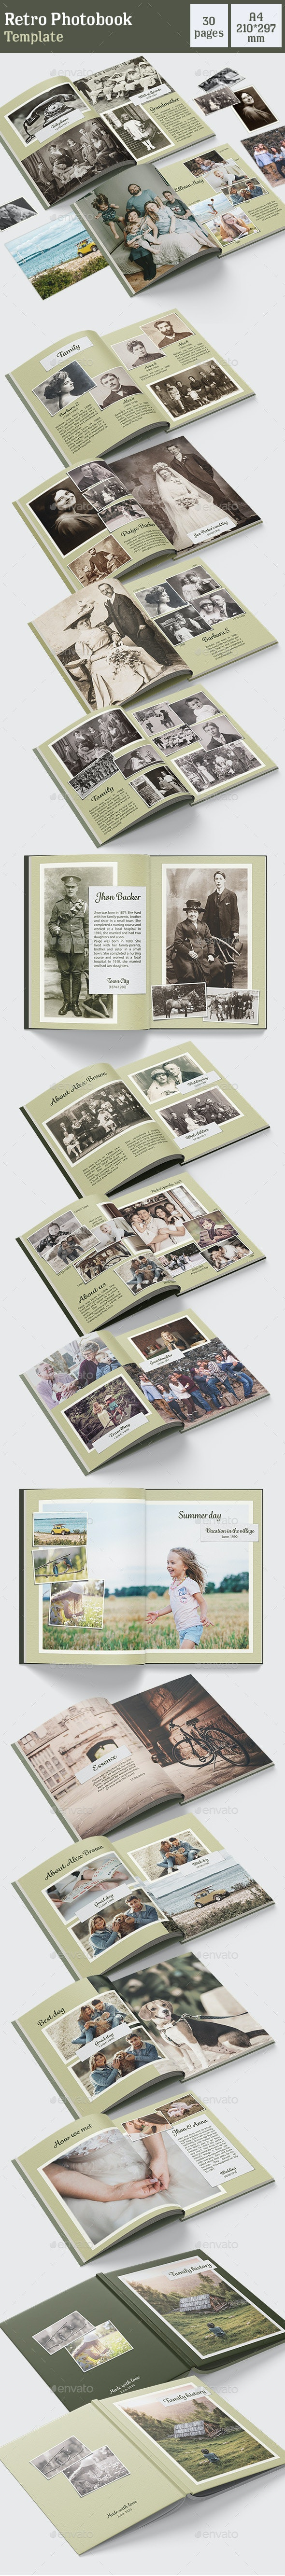 Retro Photo Book Template - Photo Albums Print Templates